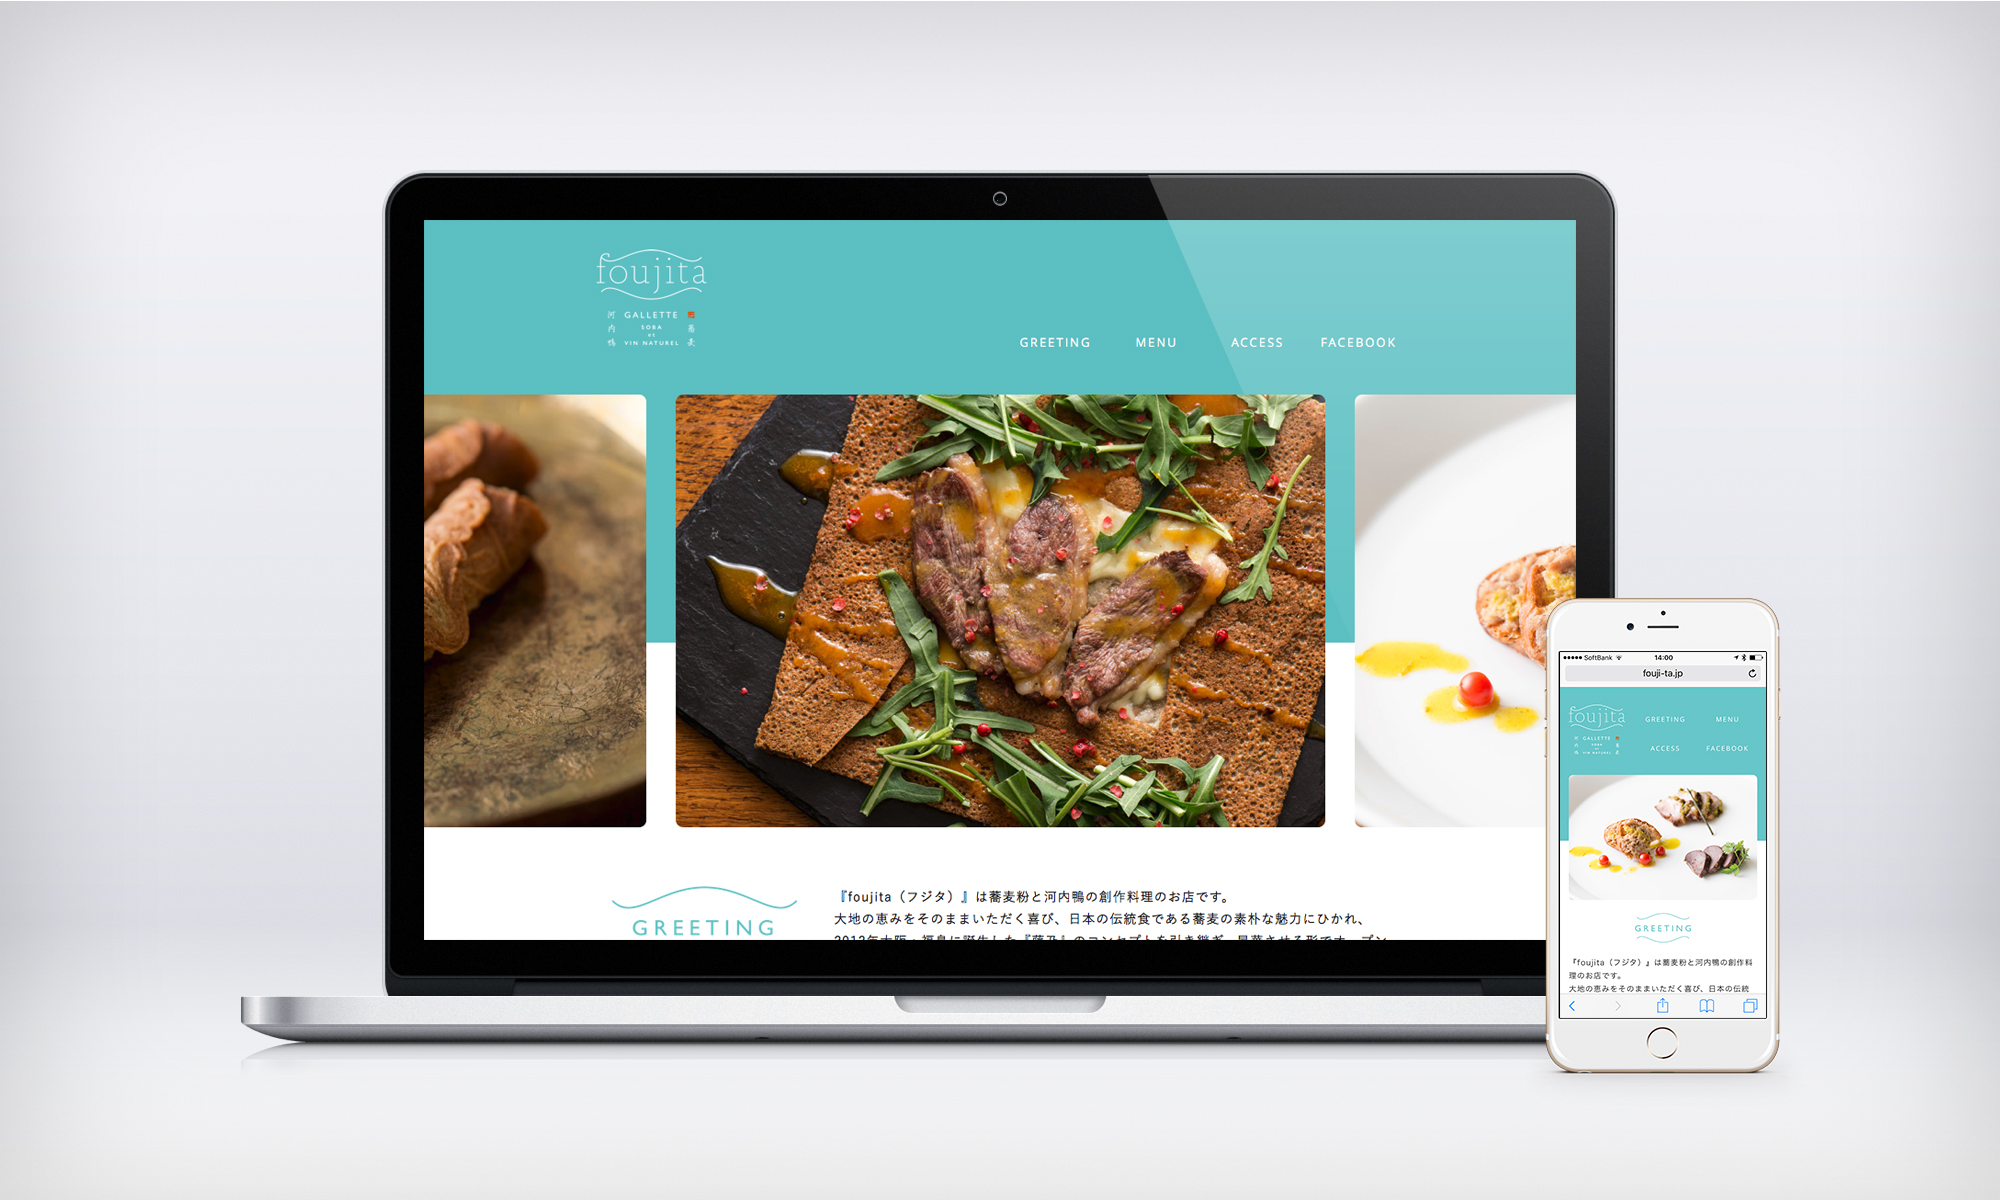 foujita Webサイト